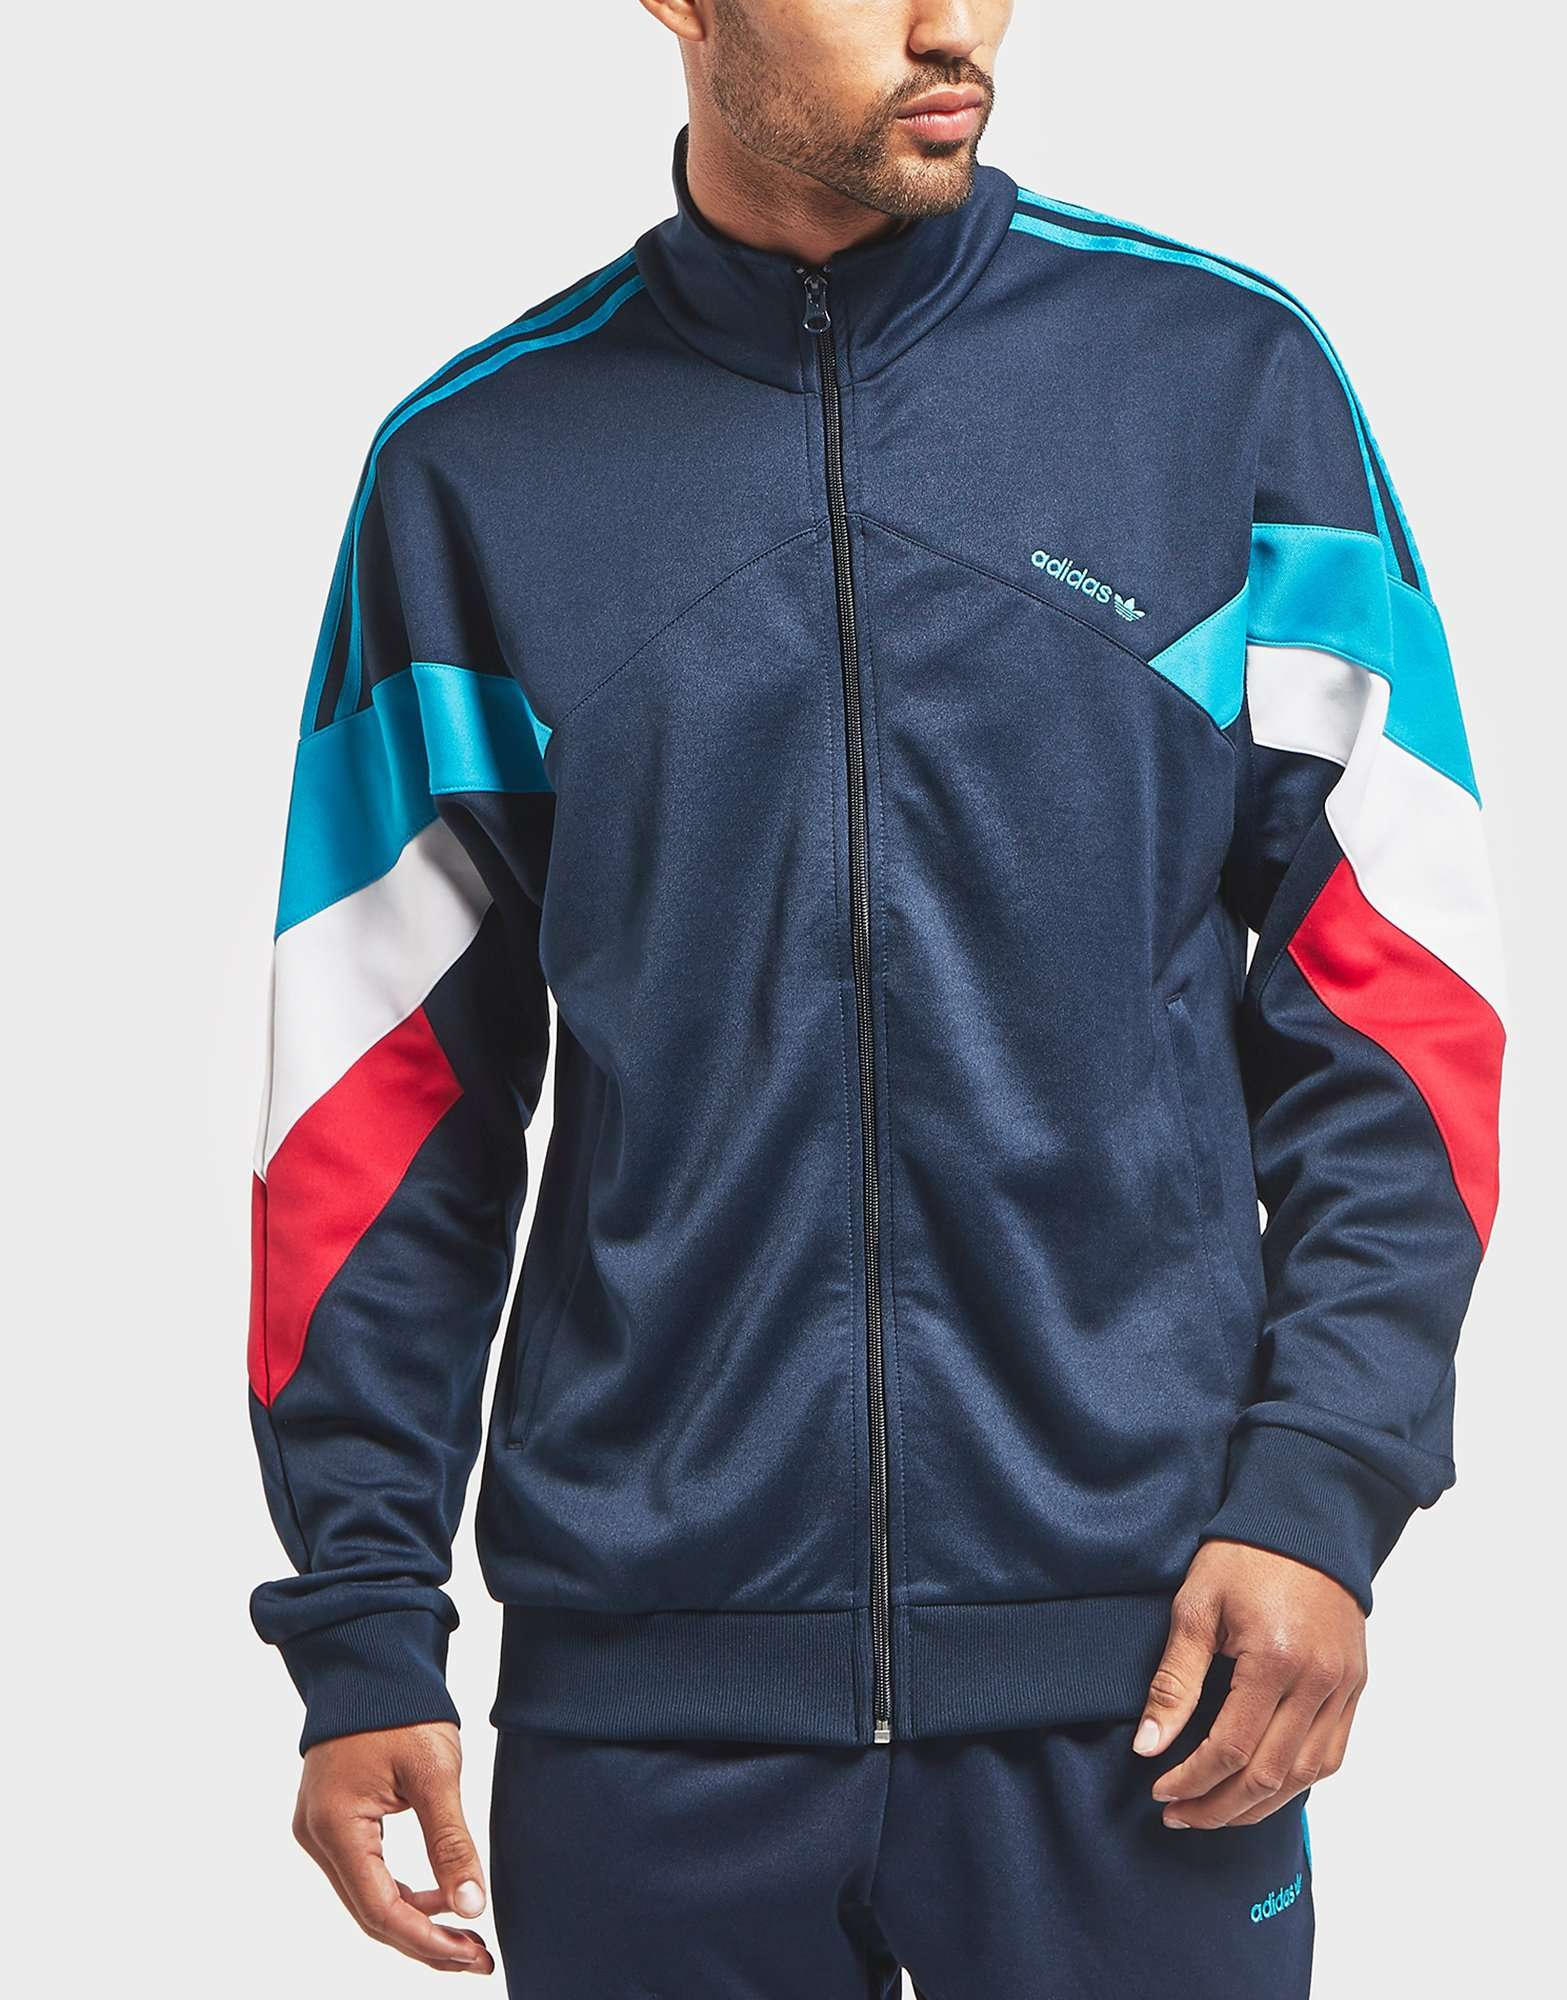 Adidas Originals Palmeston Track Top Scotts Menswear